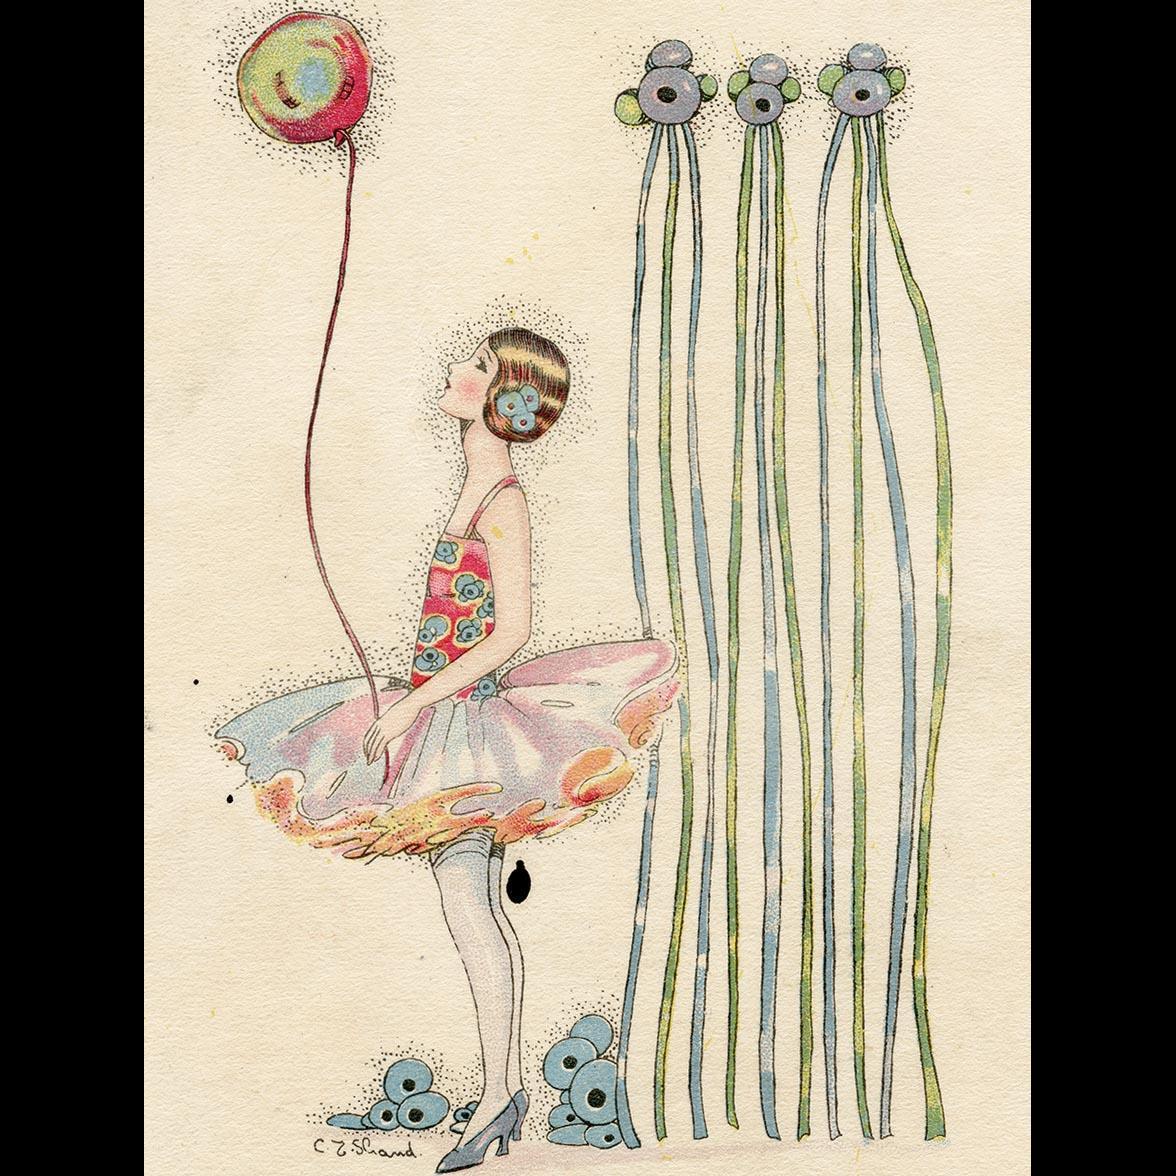 Art Deco Happy Birthday Balloon Girl In Tutu Artist Signed C E